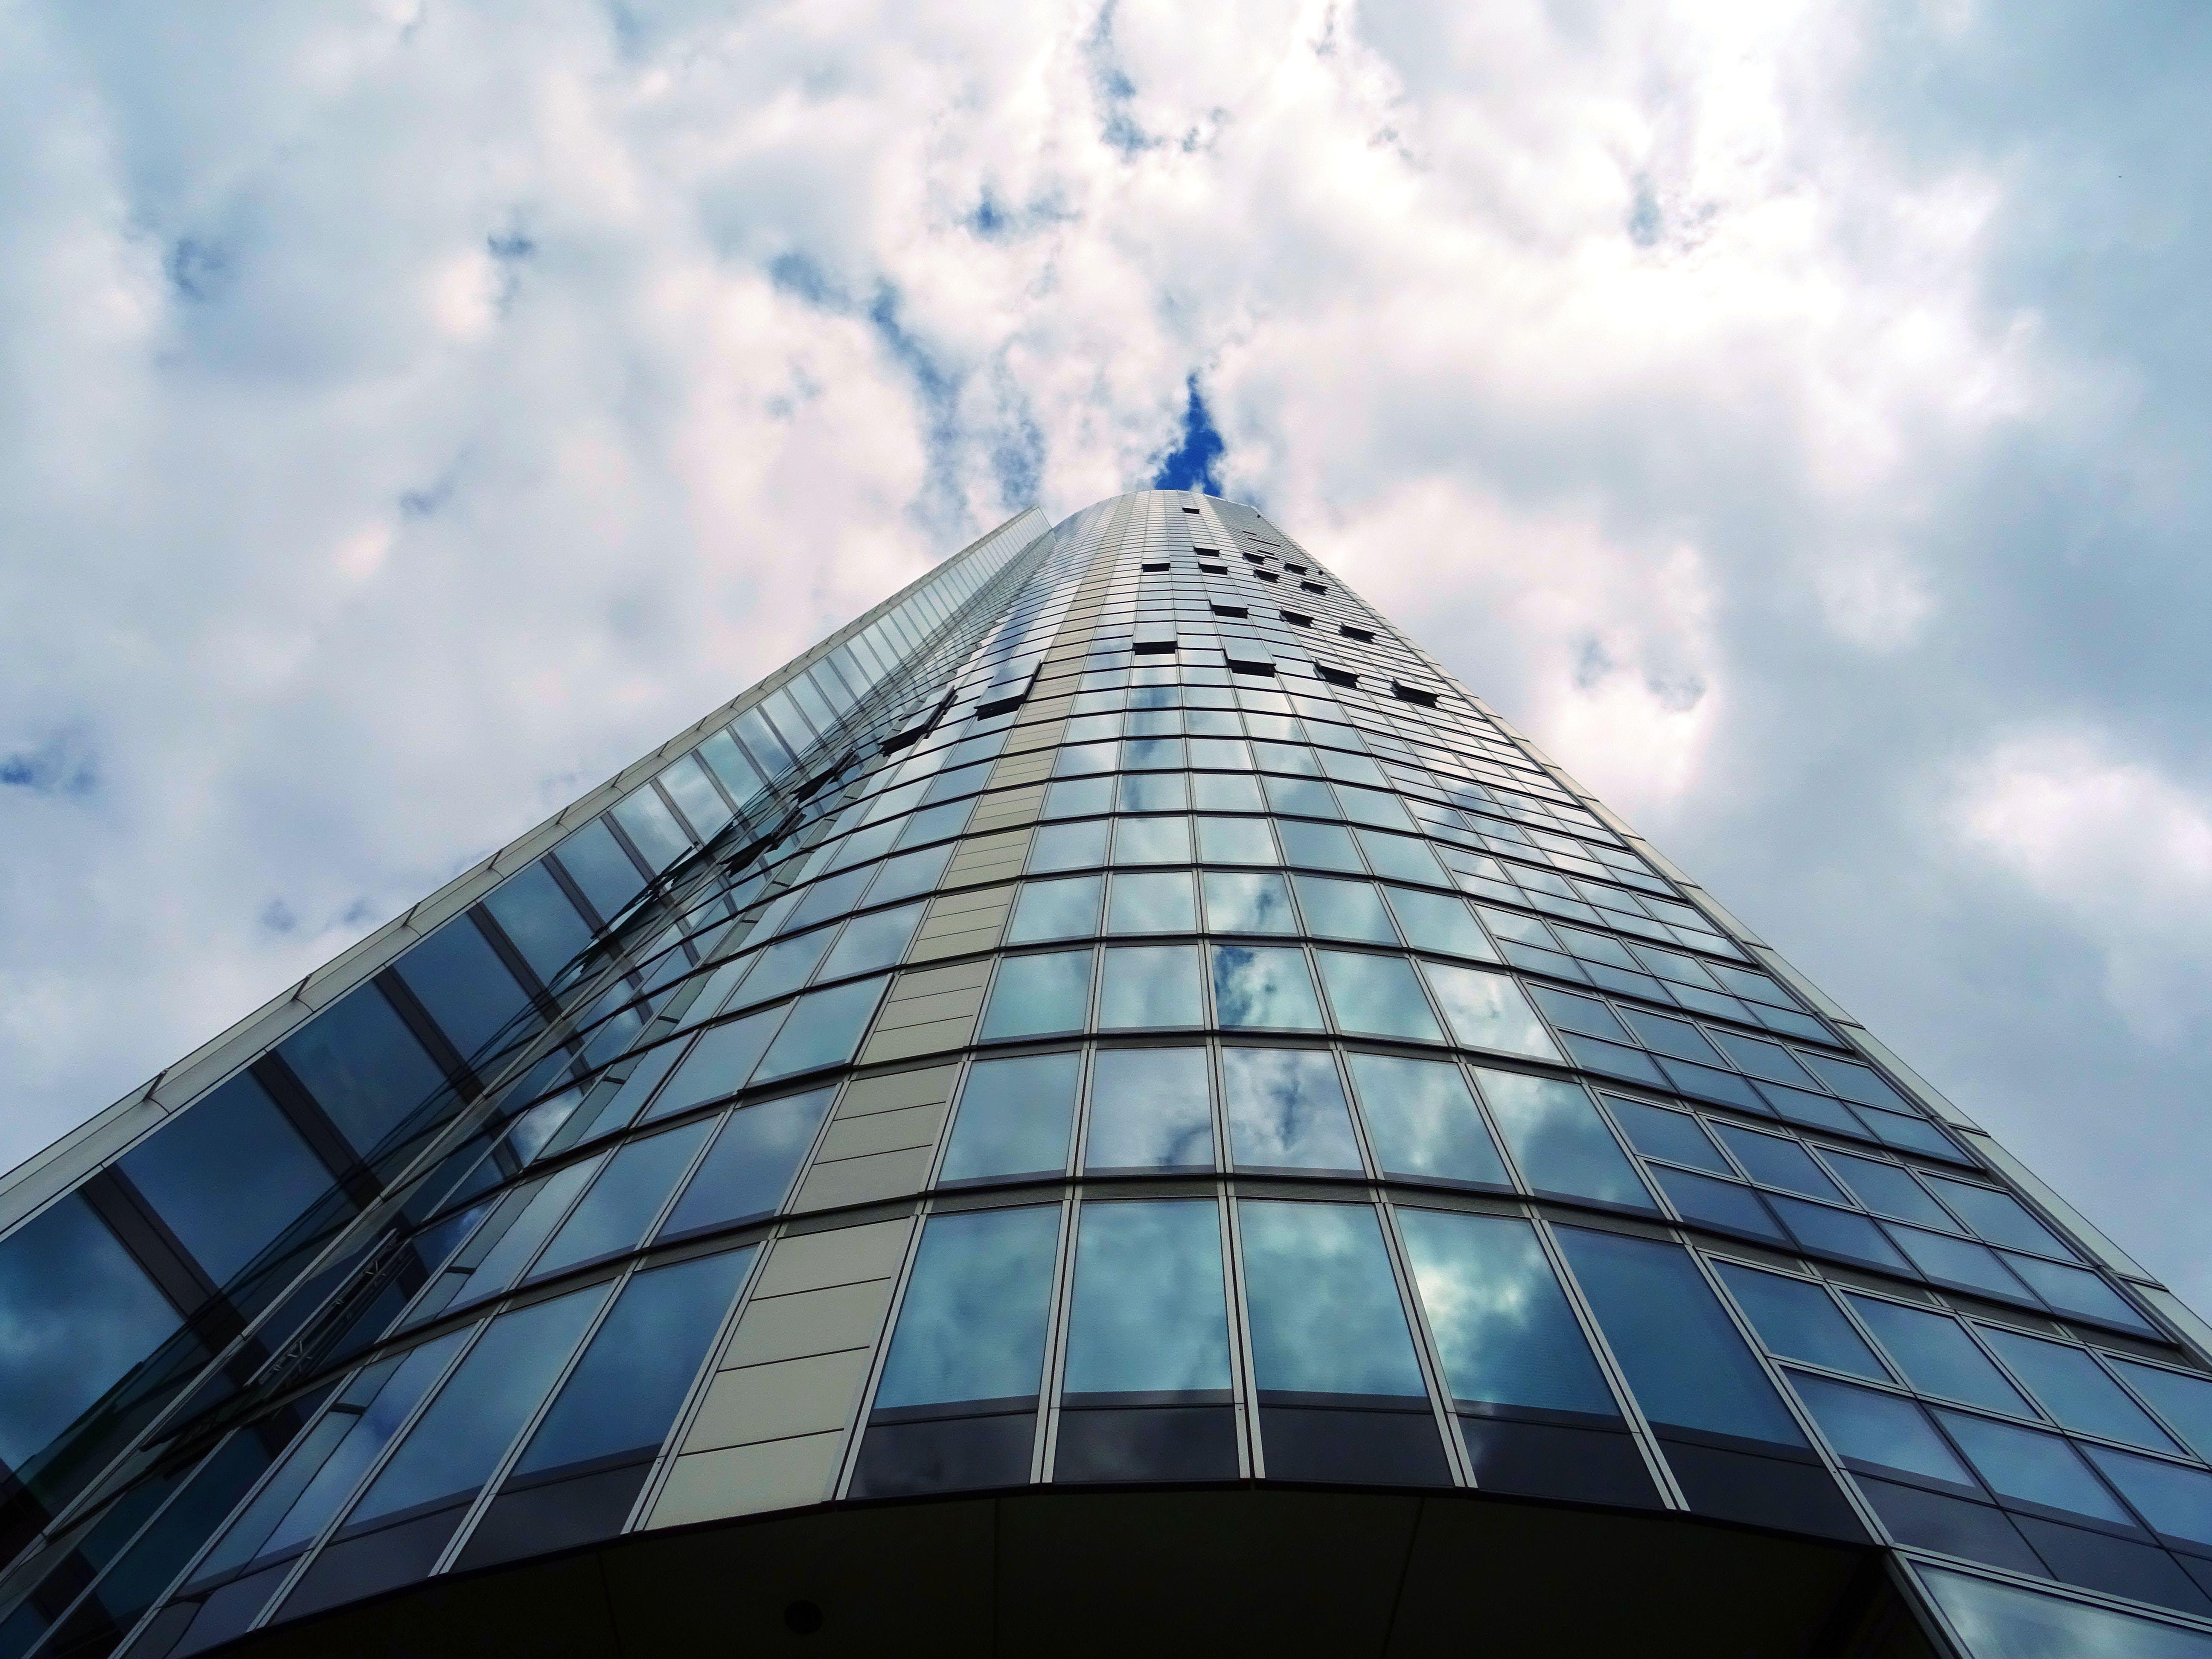 Blue Glass Panel Building